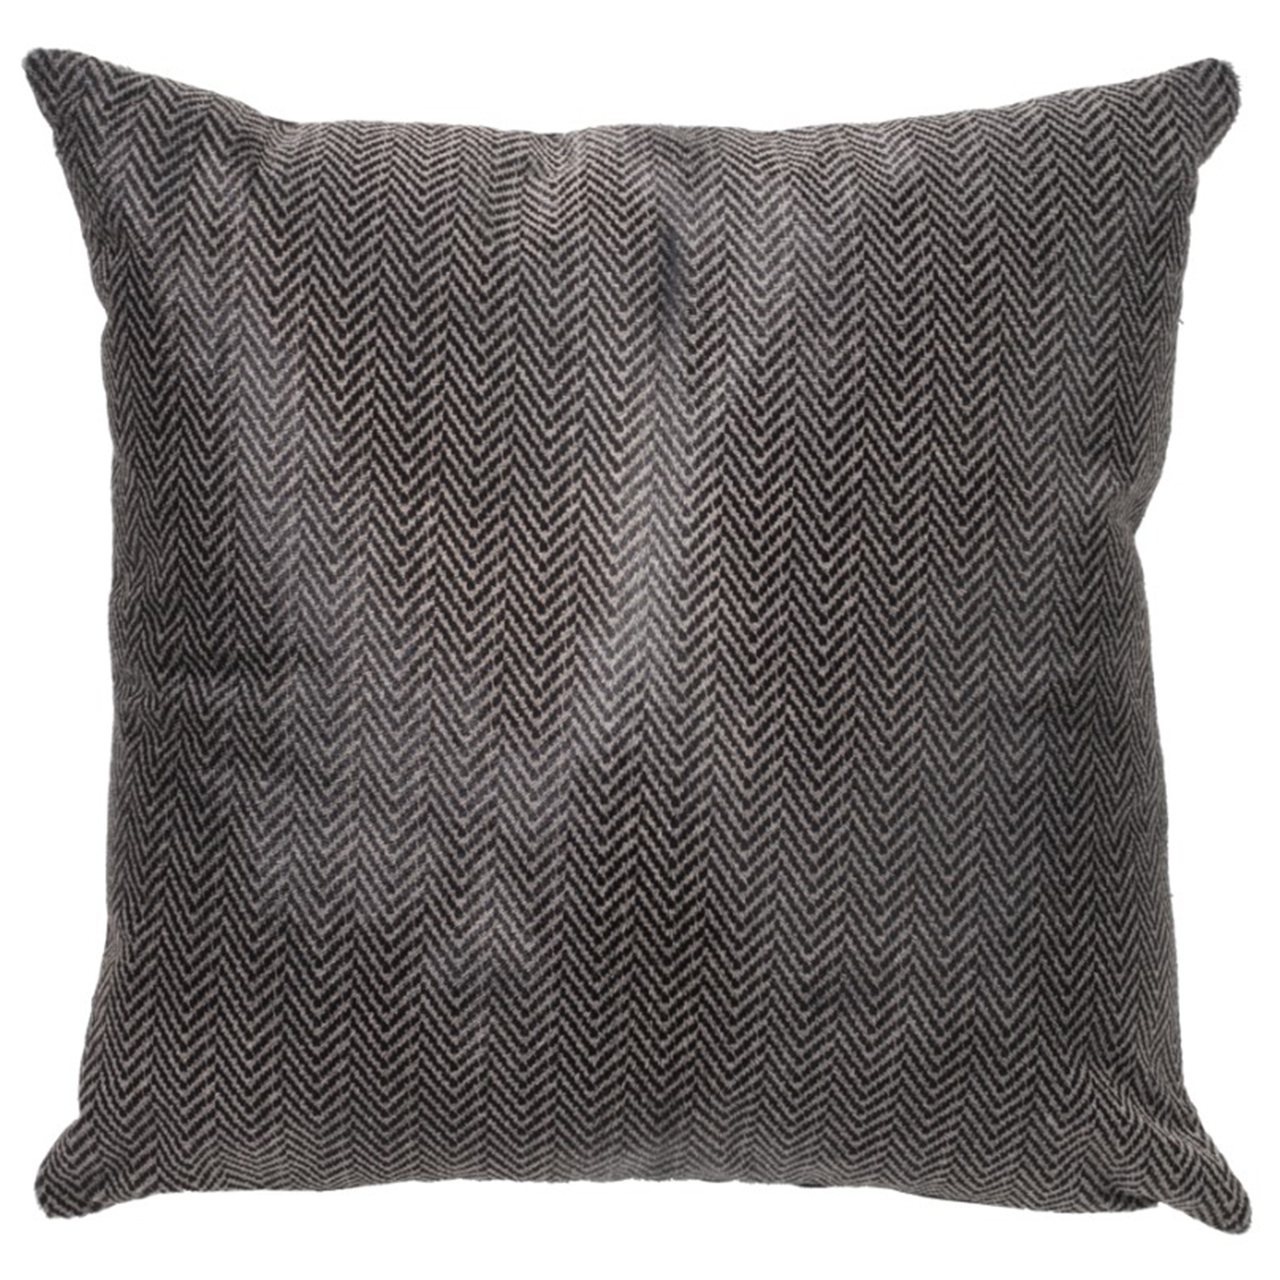 NEW-Cavalino Pillow- Tweed 1039-600 PEG- 50x50cm (CPTWE1039600BL5050) - ANVOGG FEEL SHEARLING | ANVOGG